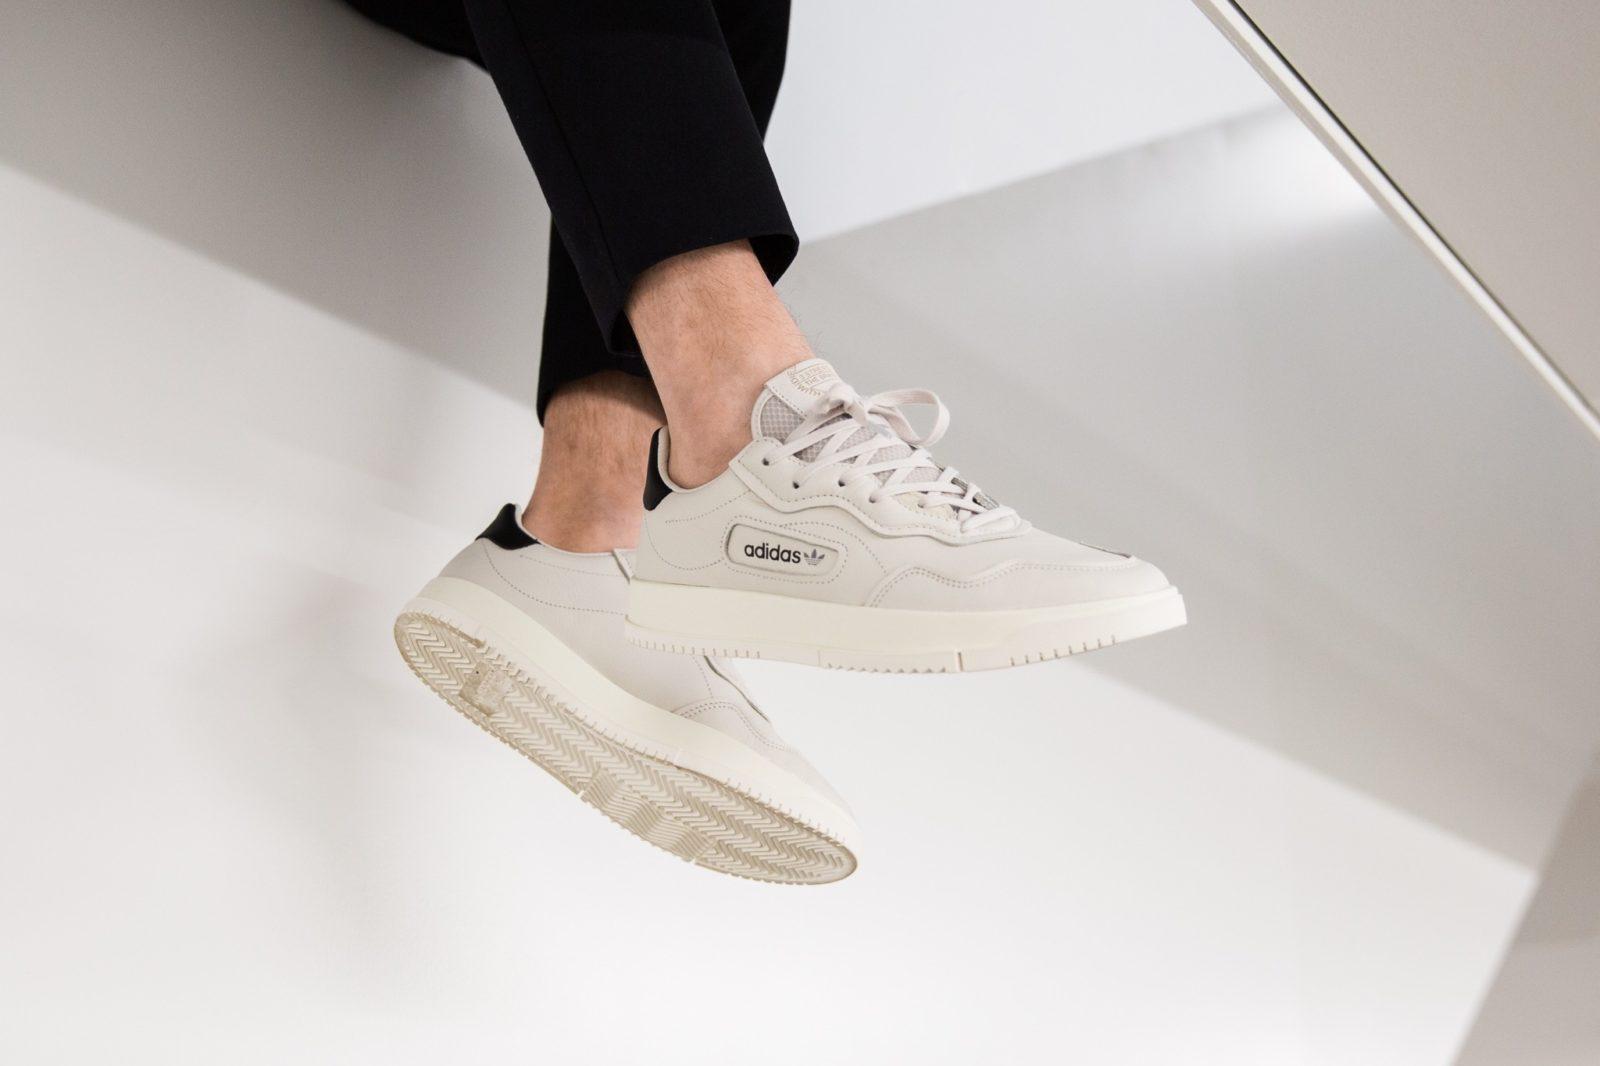 adidas Originals SC Premiere sneakers in white